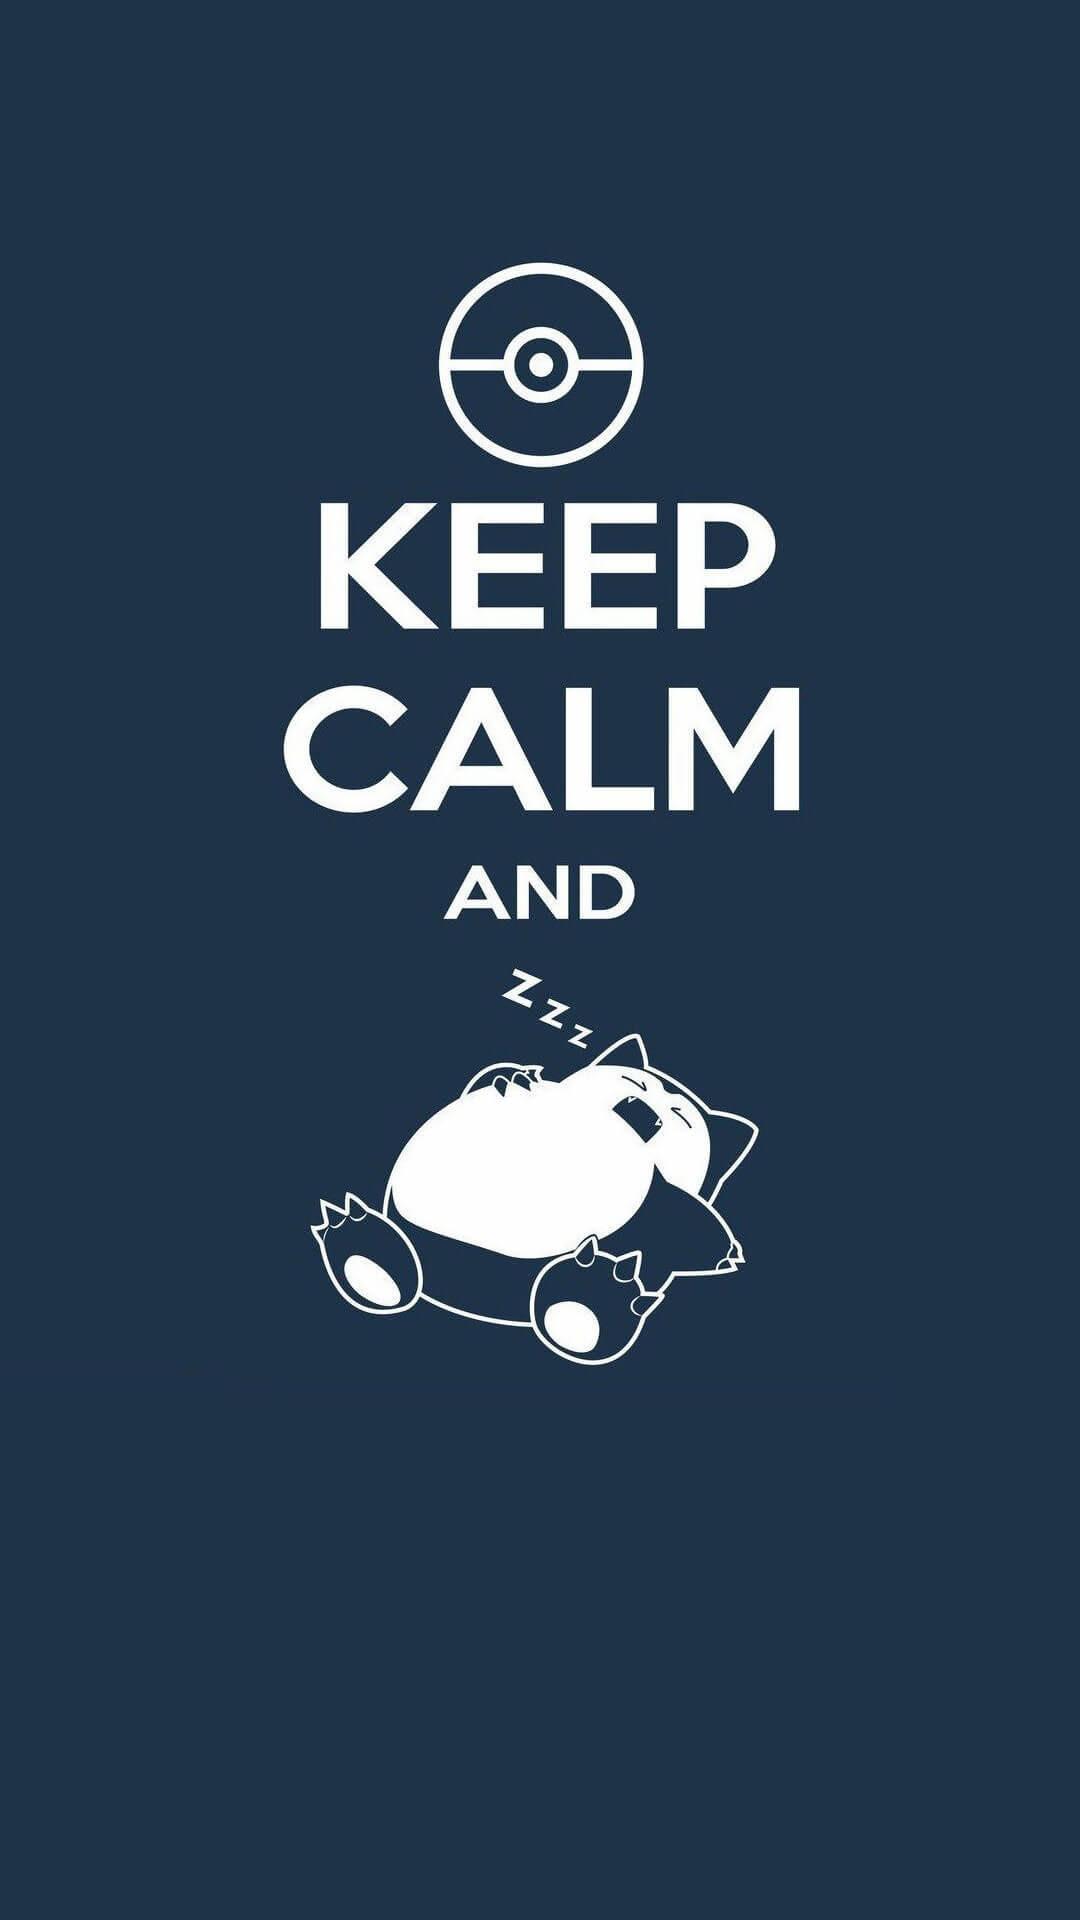 How to download HD Keep calm Panda iPhone Wallpaper:-